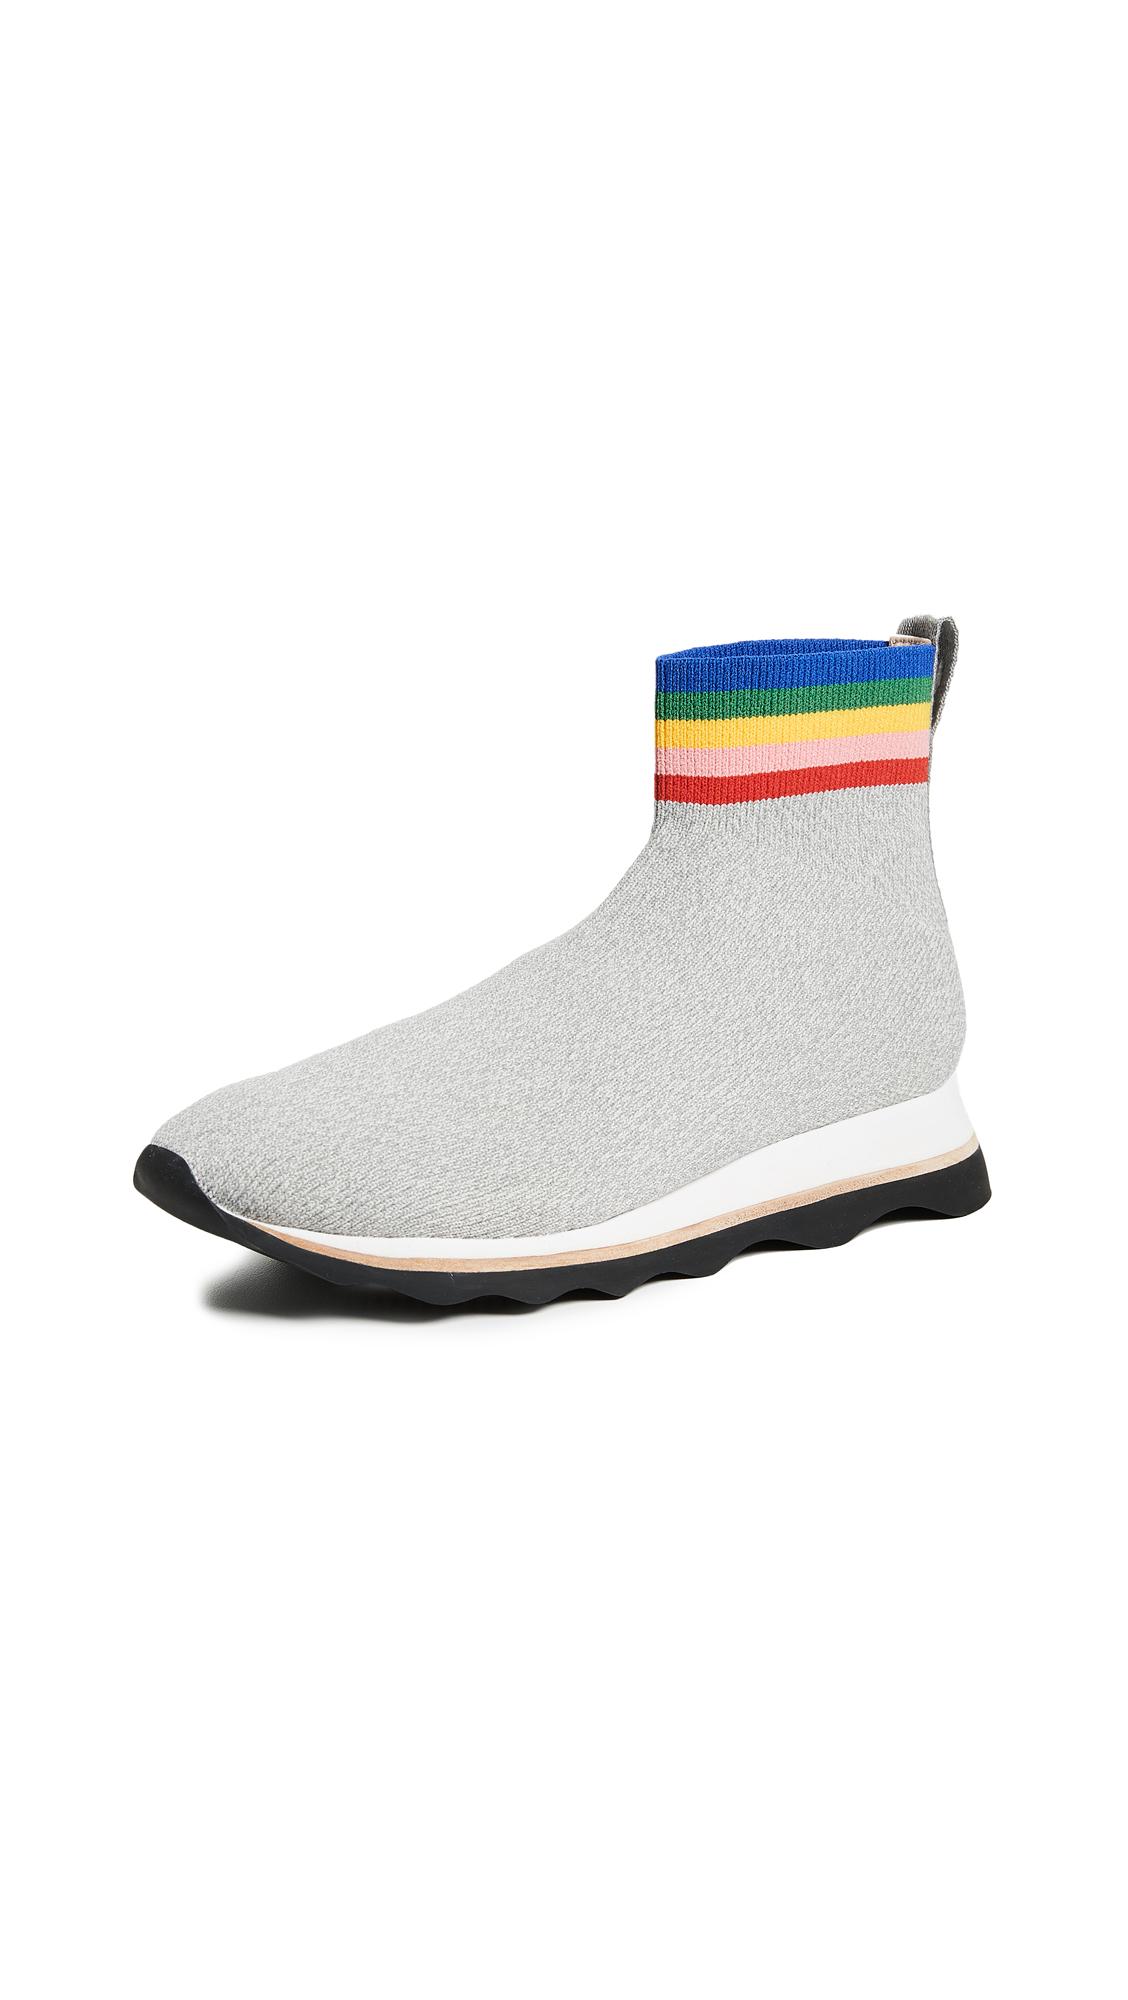 Loeffler Randall Scout Knit Joggers - Grey/Rainbow